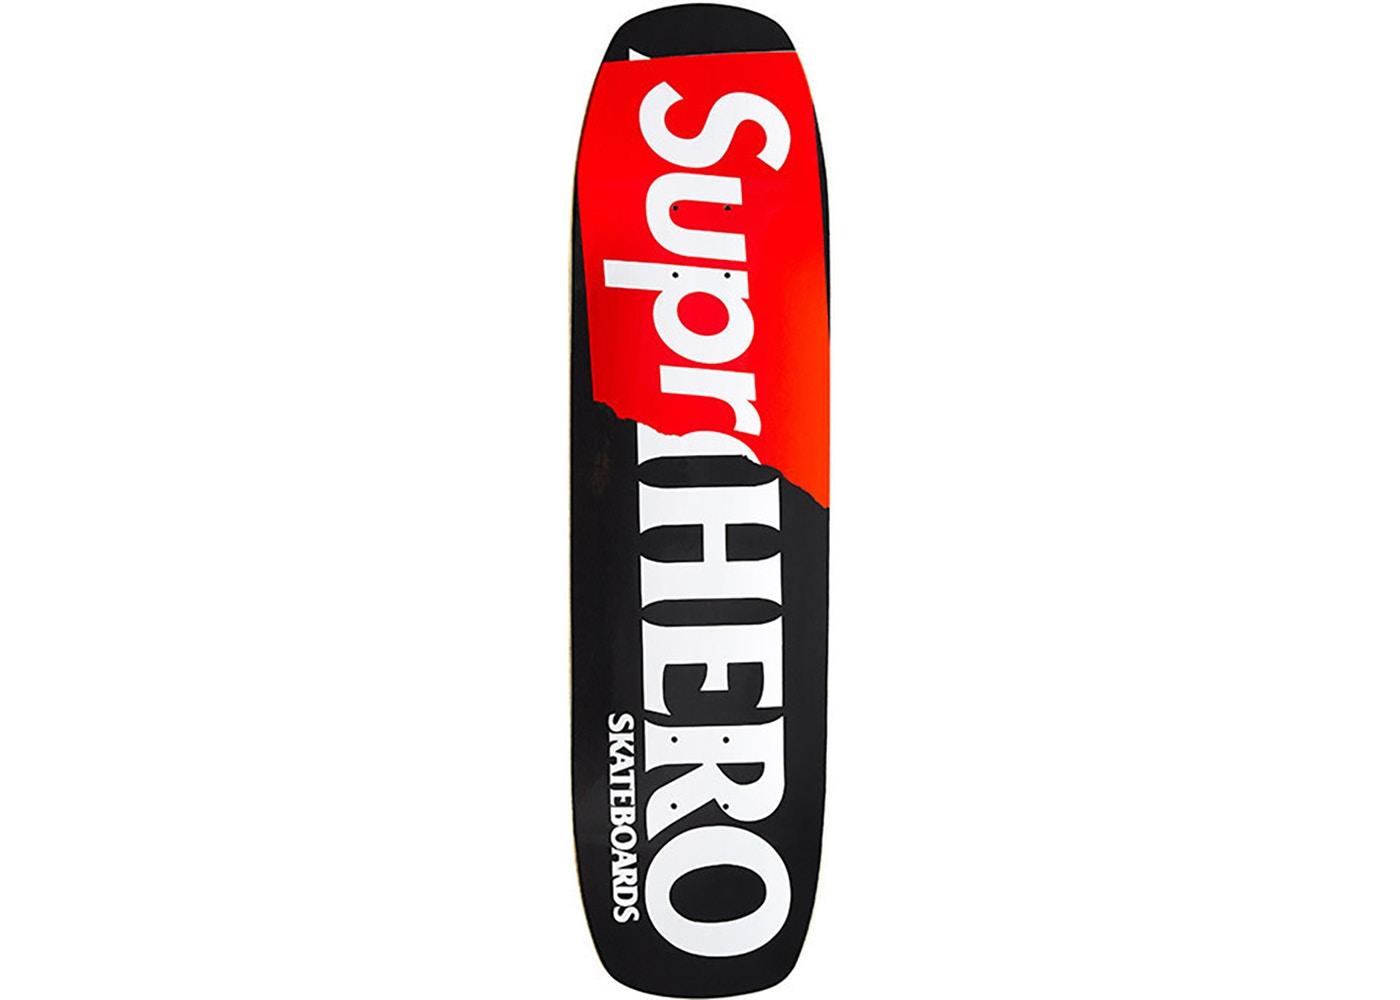 2f099ef1 Supreme Antihero Supr-Hero Skateboard Deck Black - StockX News